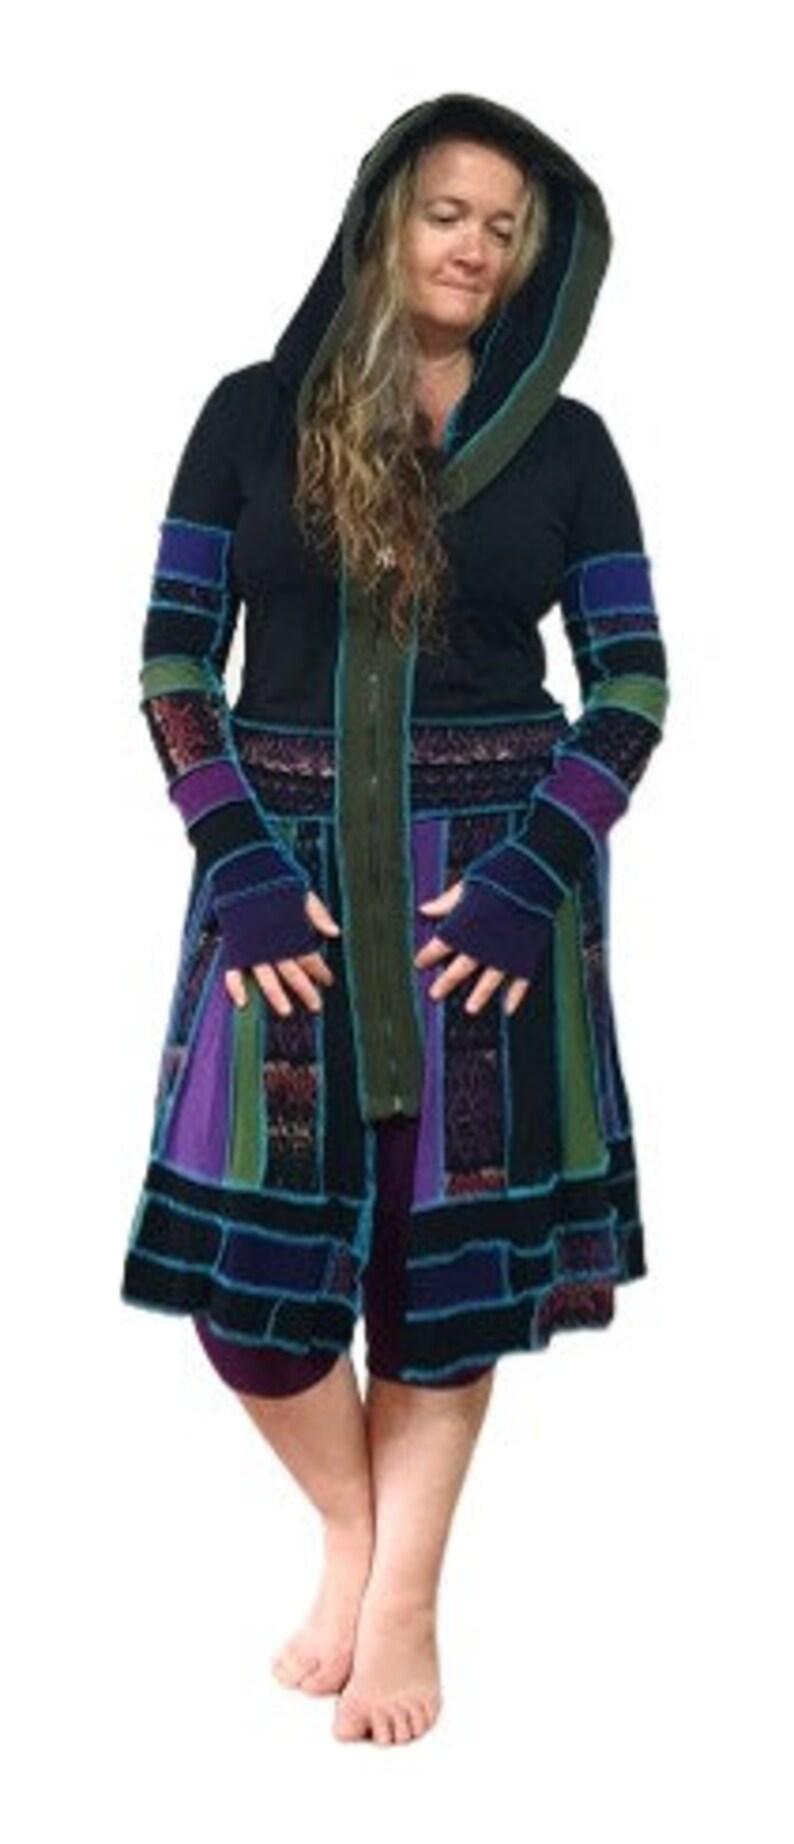 Gypsy Owl *Keisha* Up-cycled Woman/'s Jacket Dress festival fashion